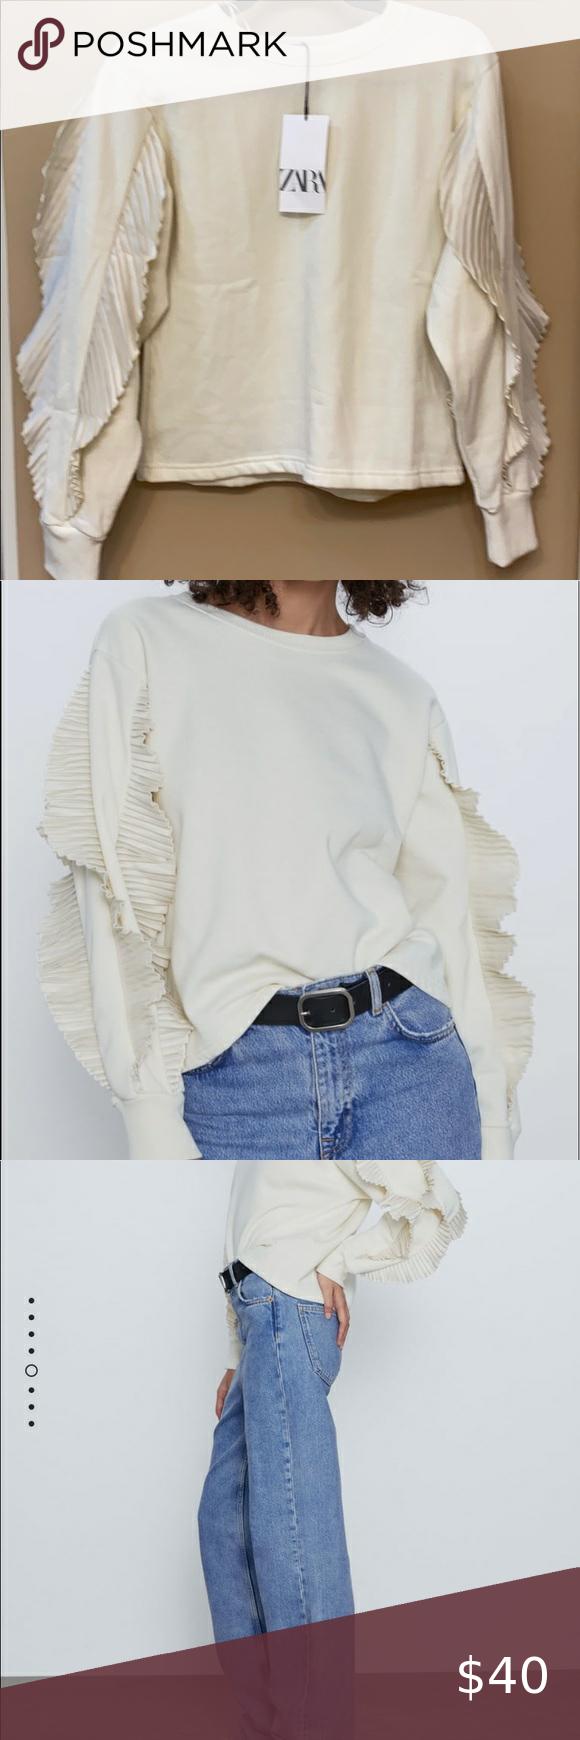 7 Sweatshirts That Look Like Real Shirts Boston Mamas Dressy Sweatshirt Fashion Sweatshirts [ 1480 x 1286 Pixel ]